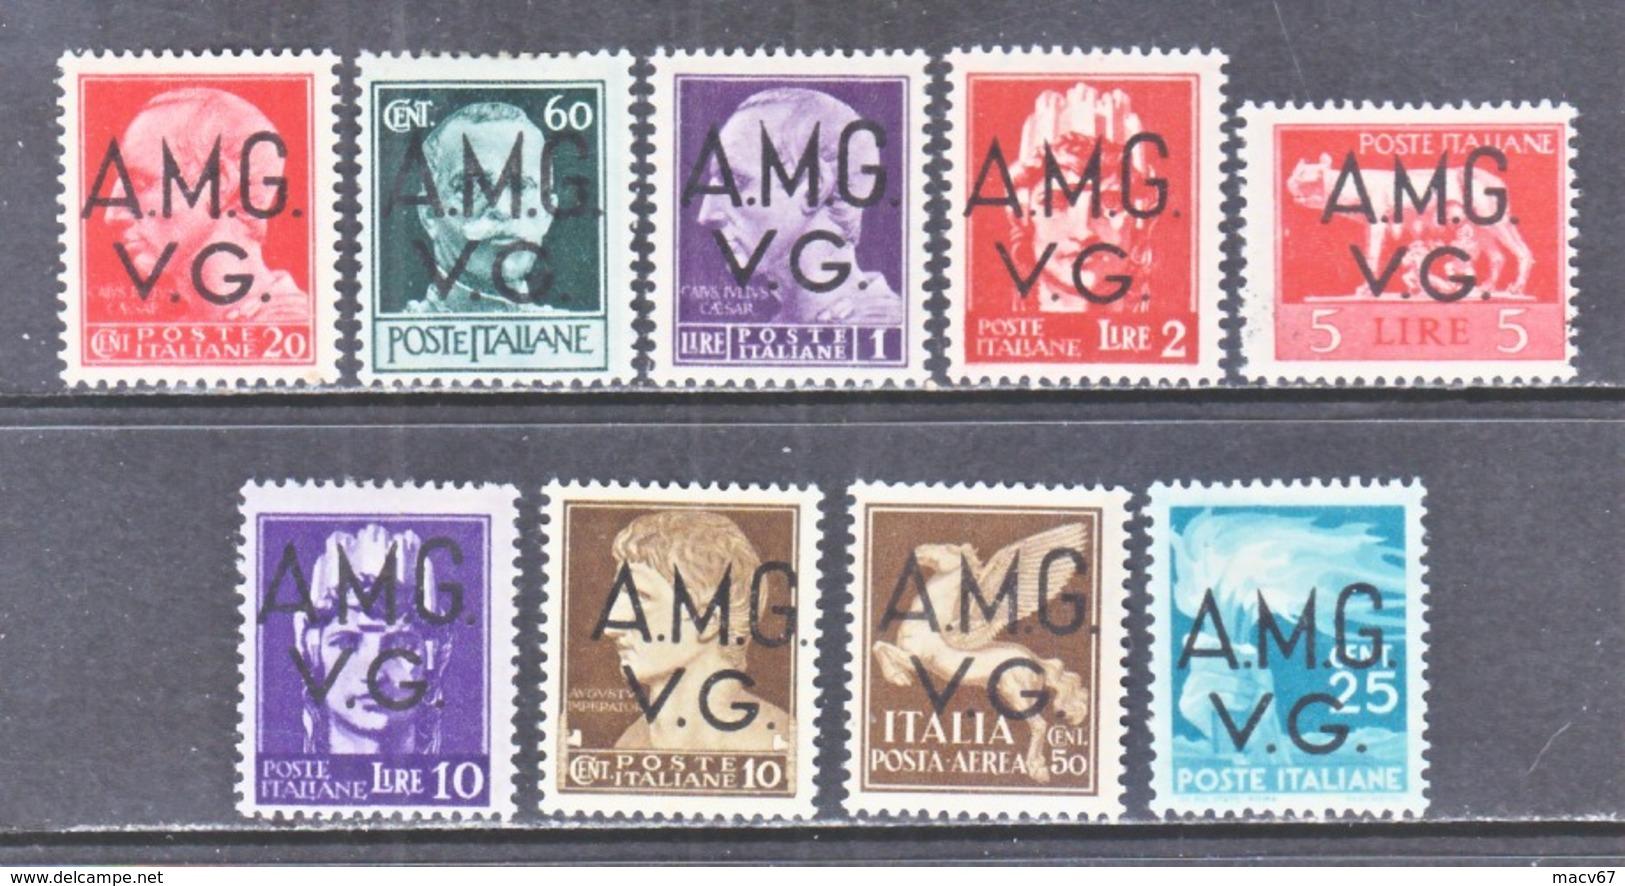 Italy AMG-VG 1 LN 2+   *  (o) - 7. Trieste